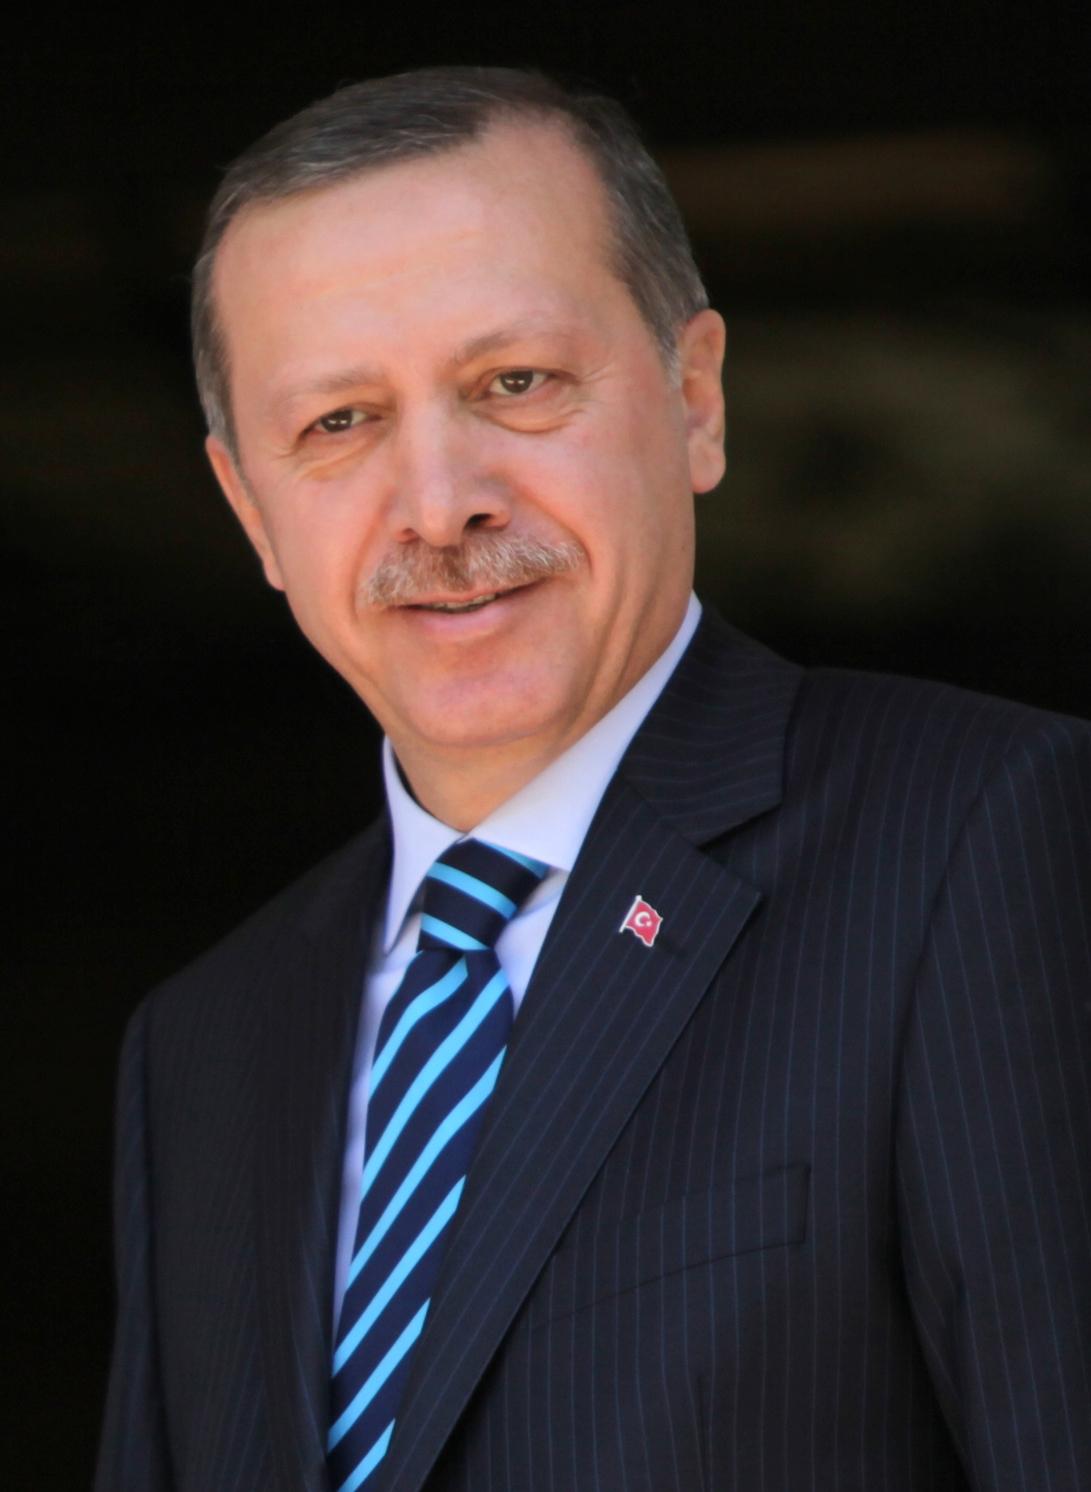 Recep Tayyip Erdoğan Simple English The Free Encyclopedia